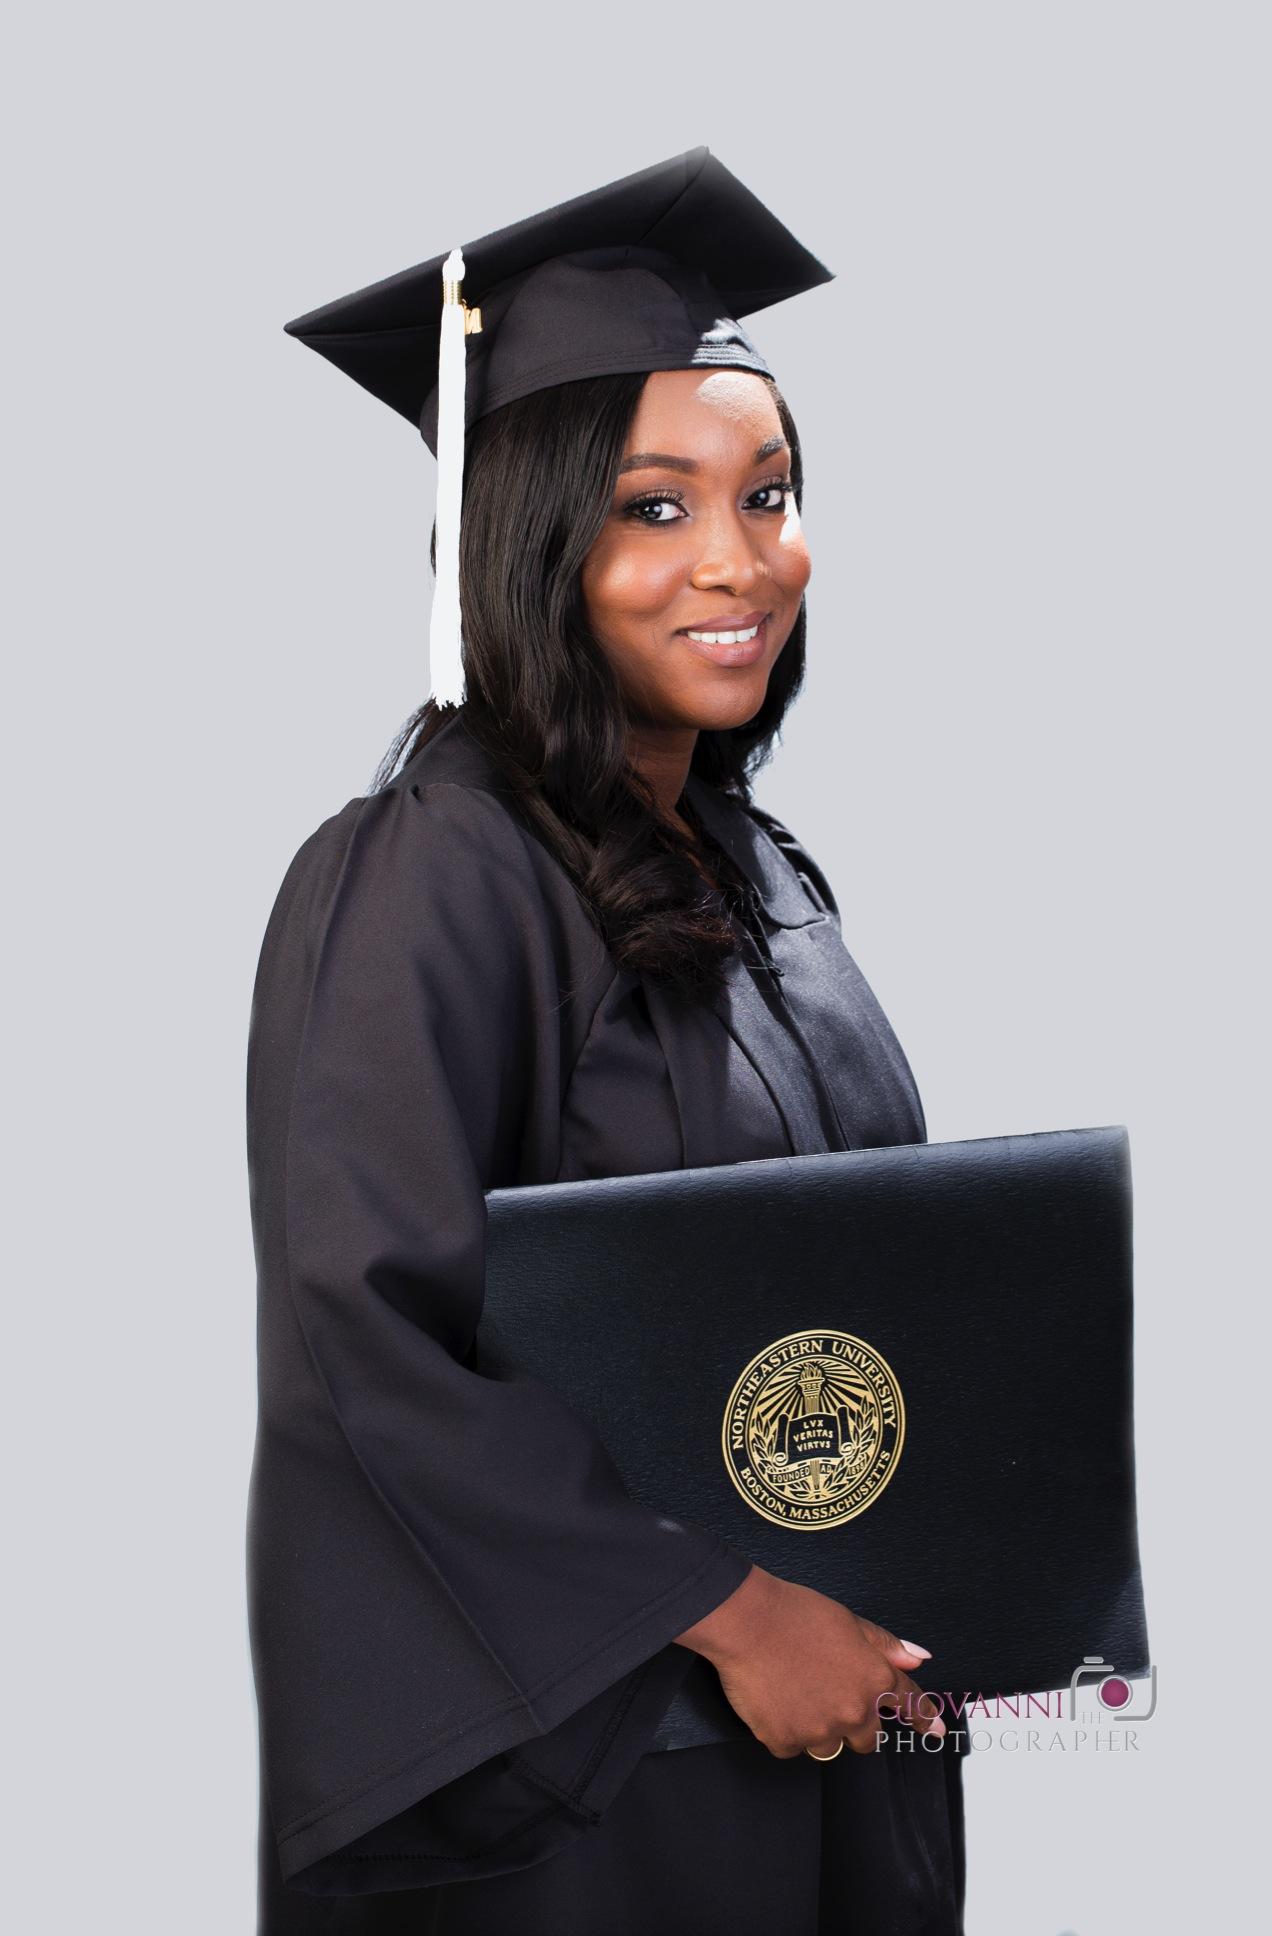 314A5339-Boston Graduation Photographer - Giovanni The Photographer - Farida (Reg) 2 WM 35.jpg